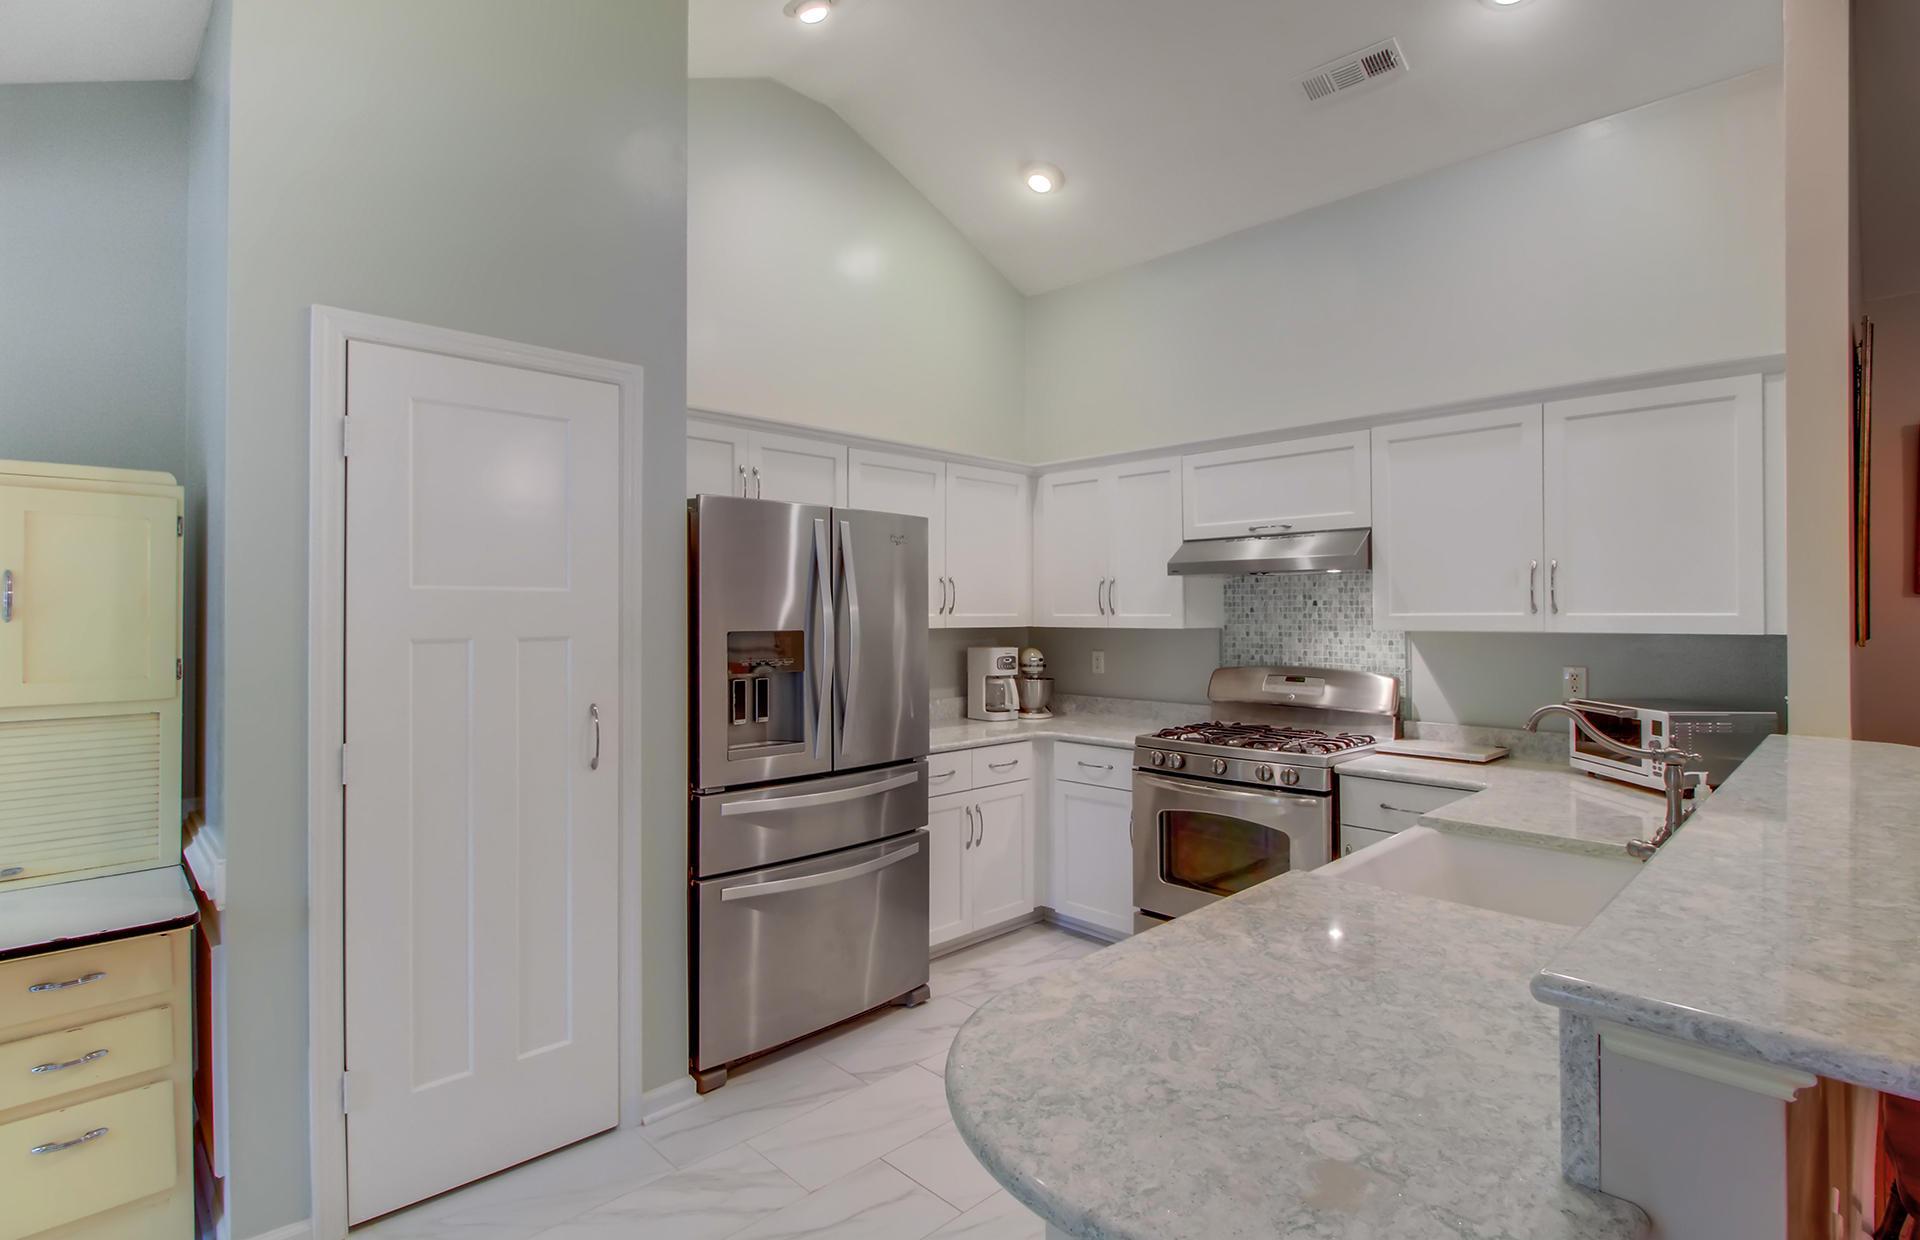 Park West Homes For Sale - 1500 Wellesley, Mount Pleasant, SC - 27